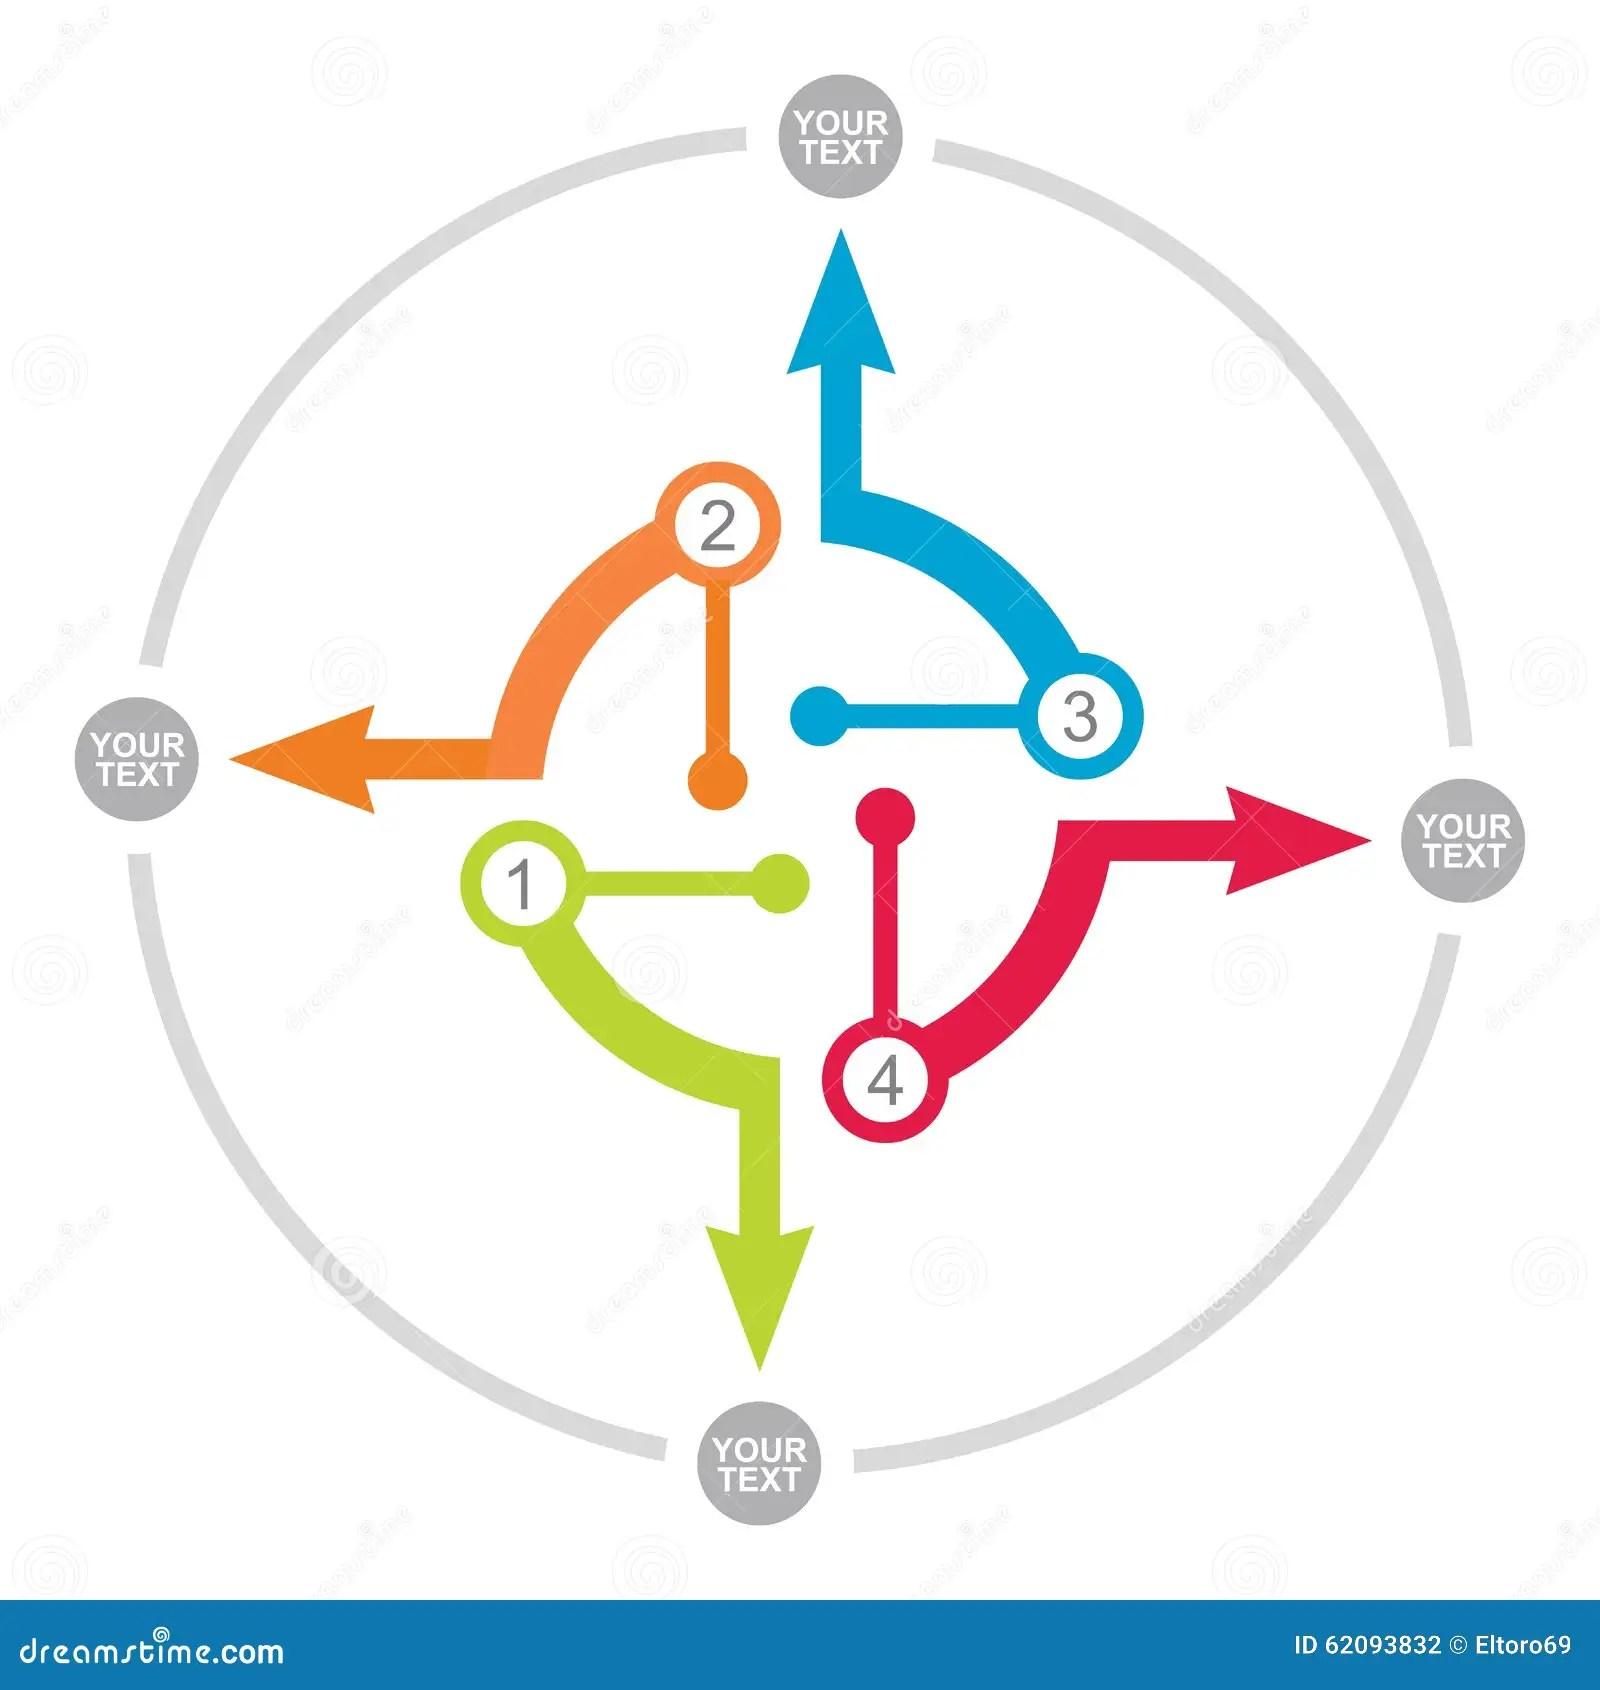 Diagram_Linear_Flow_Arrow_Process_Diagram_Powerpoint_Template_Slide03. Flow  Chart Template Stock Vector – Image: 62093832